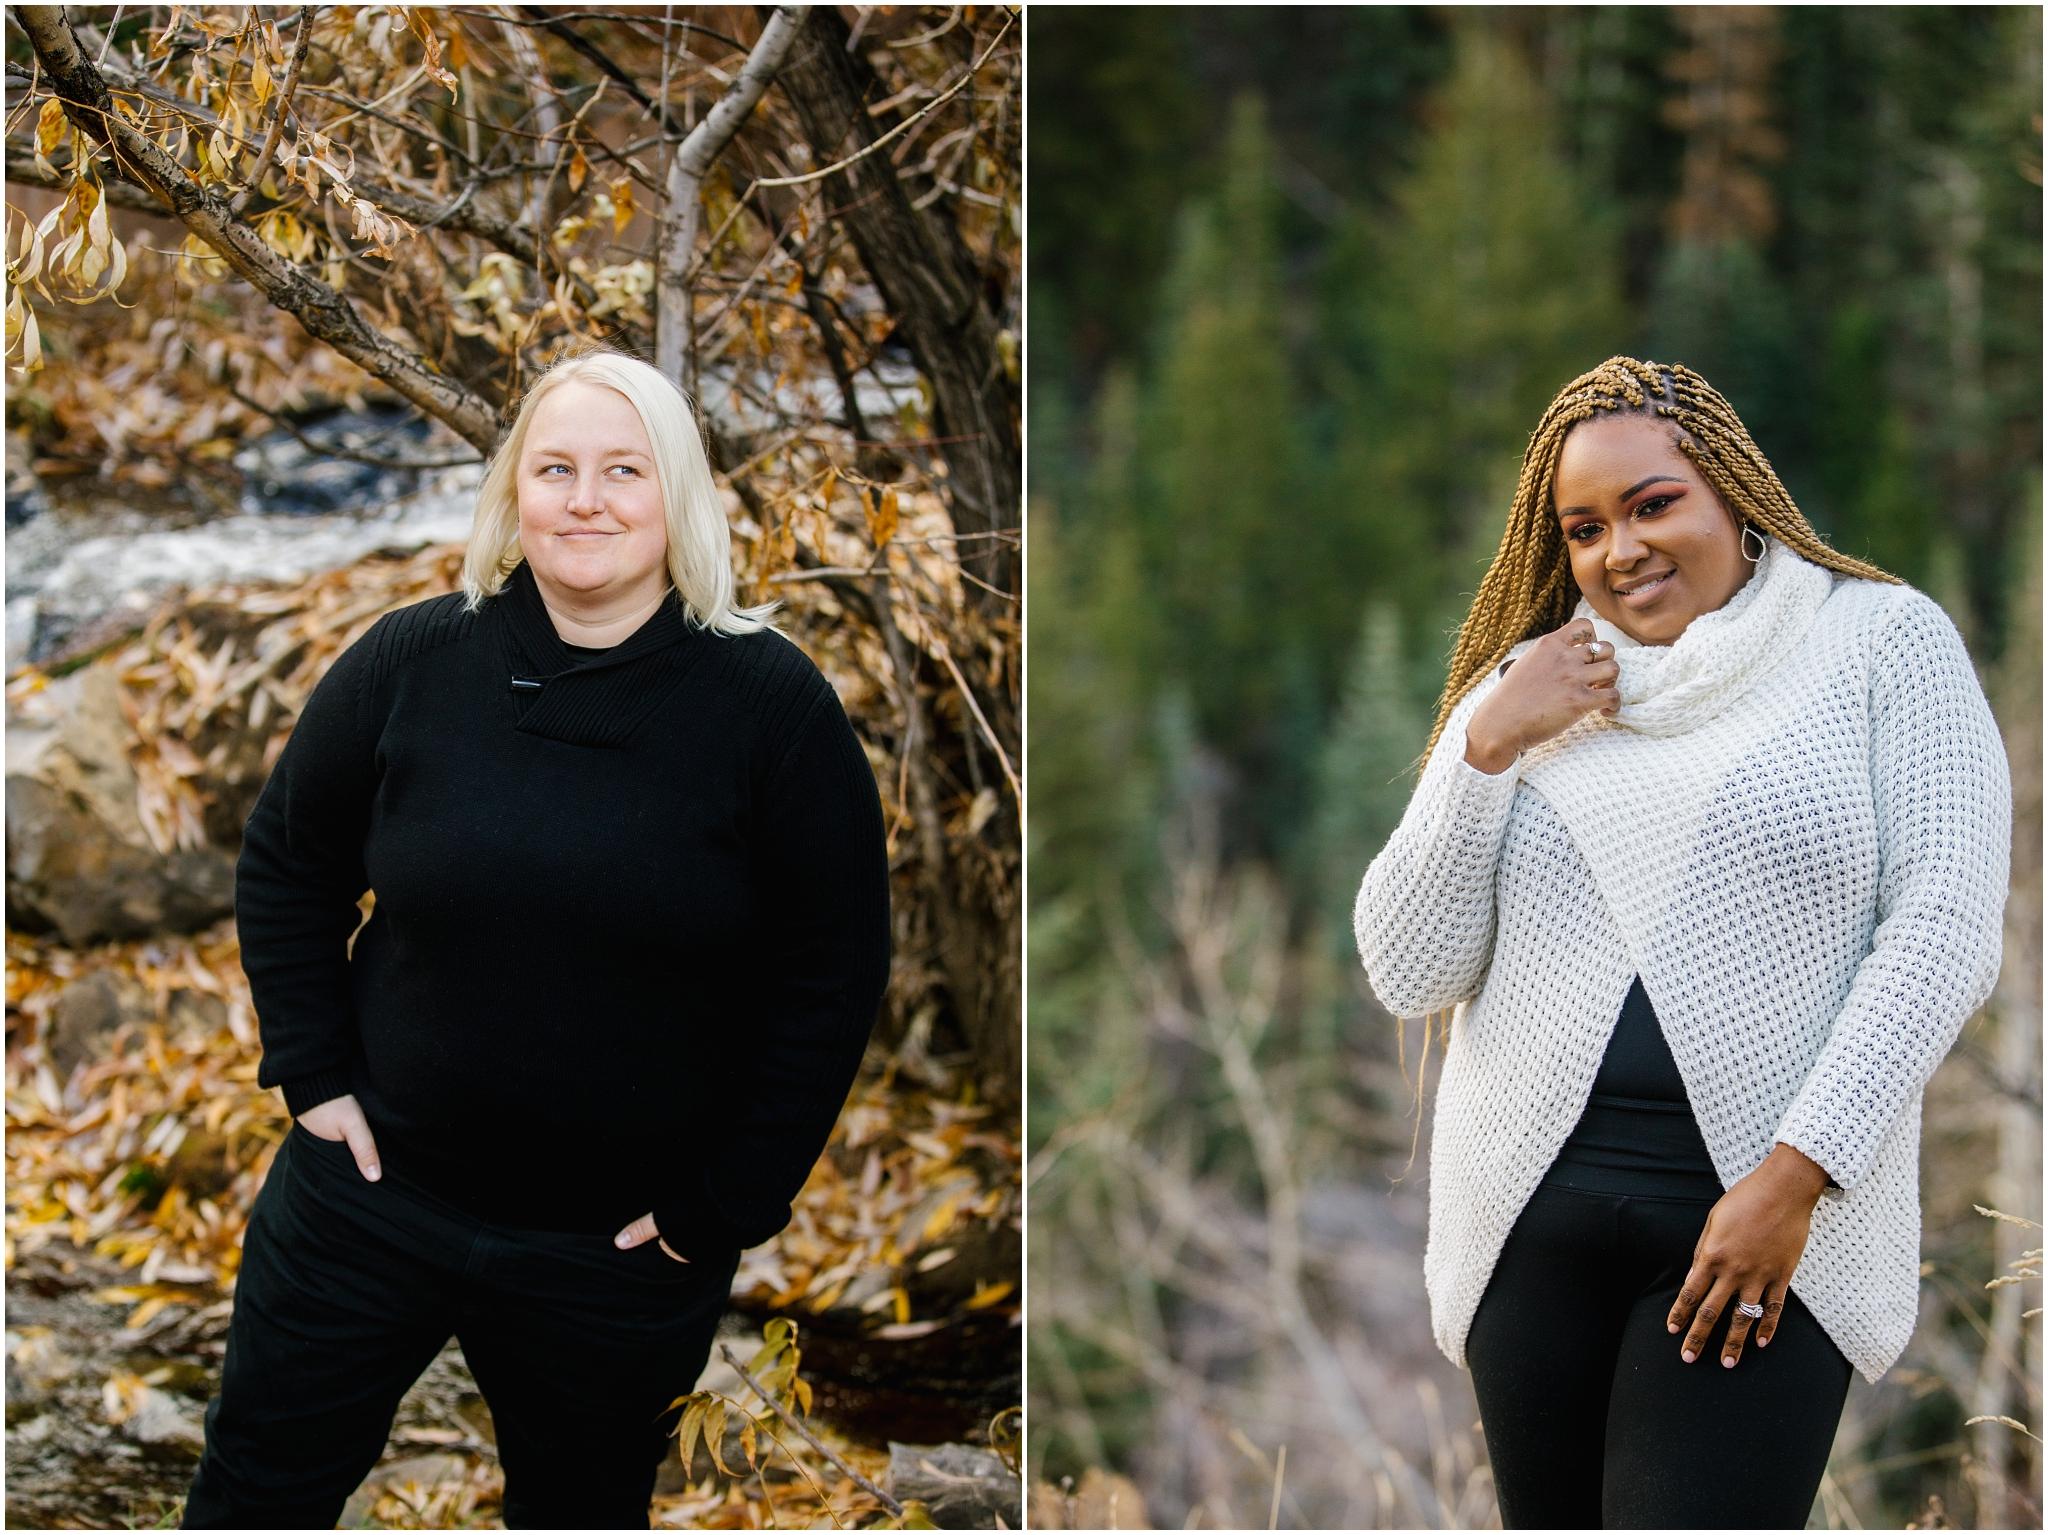 LisaTiffany2018-80_Lizzie-B-Imagery-Utah-Family-Photographer-Salt-Lake-City-Park-City-Miners-Hospital-Community-Center.jpg